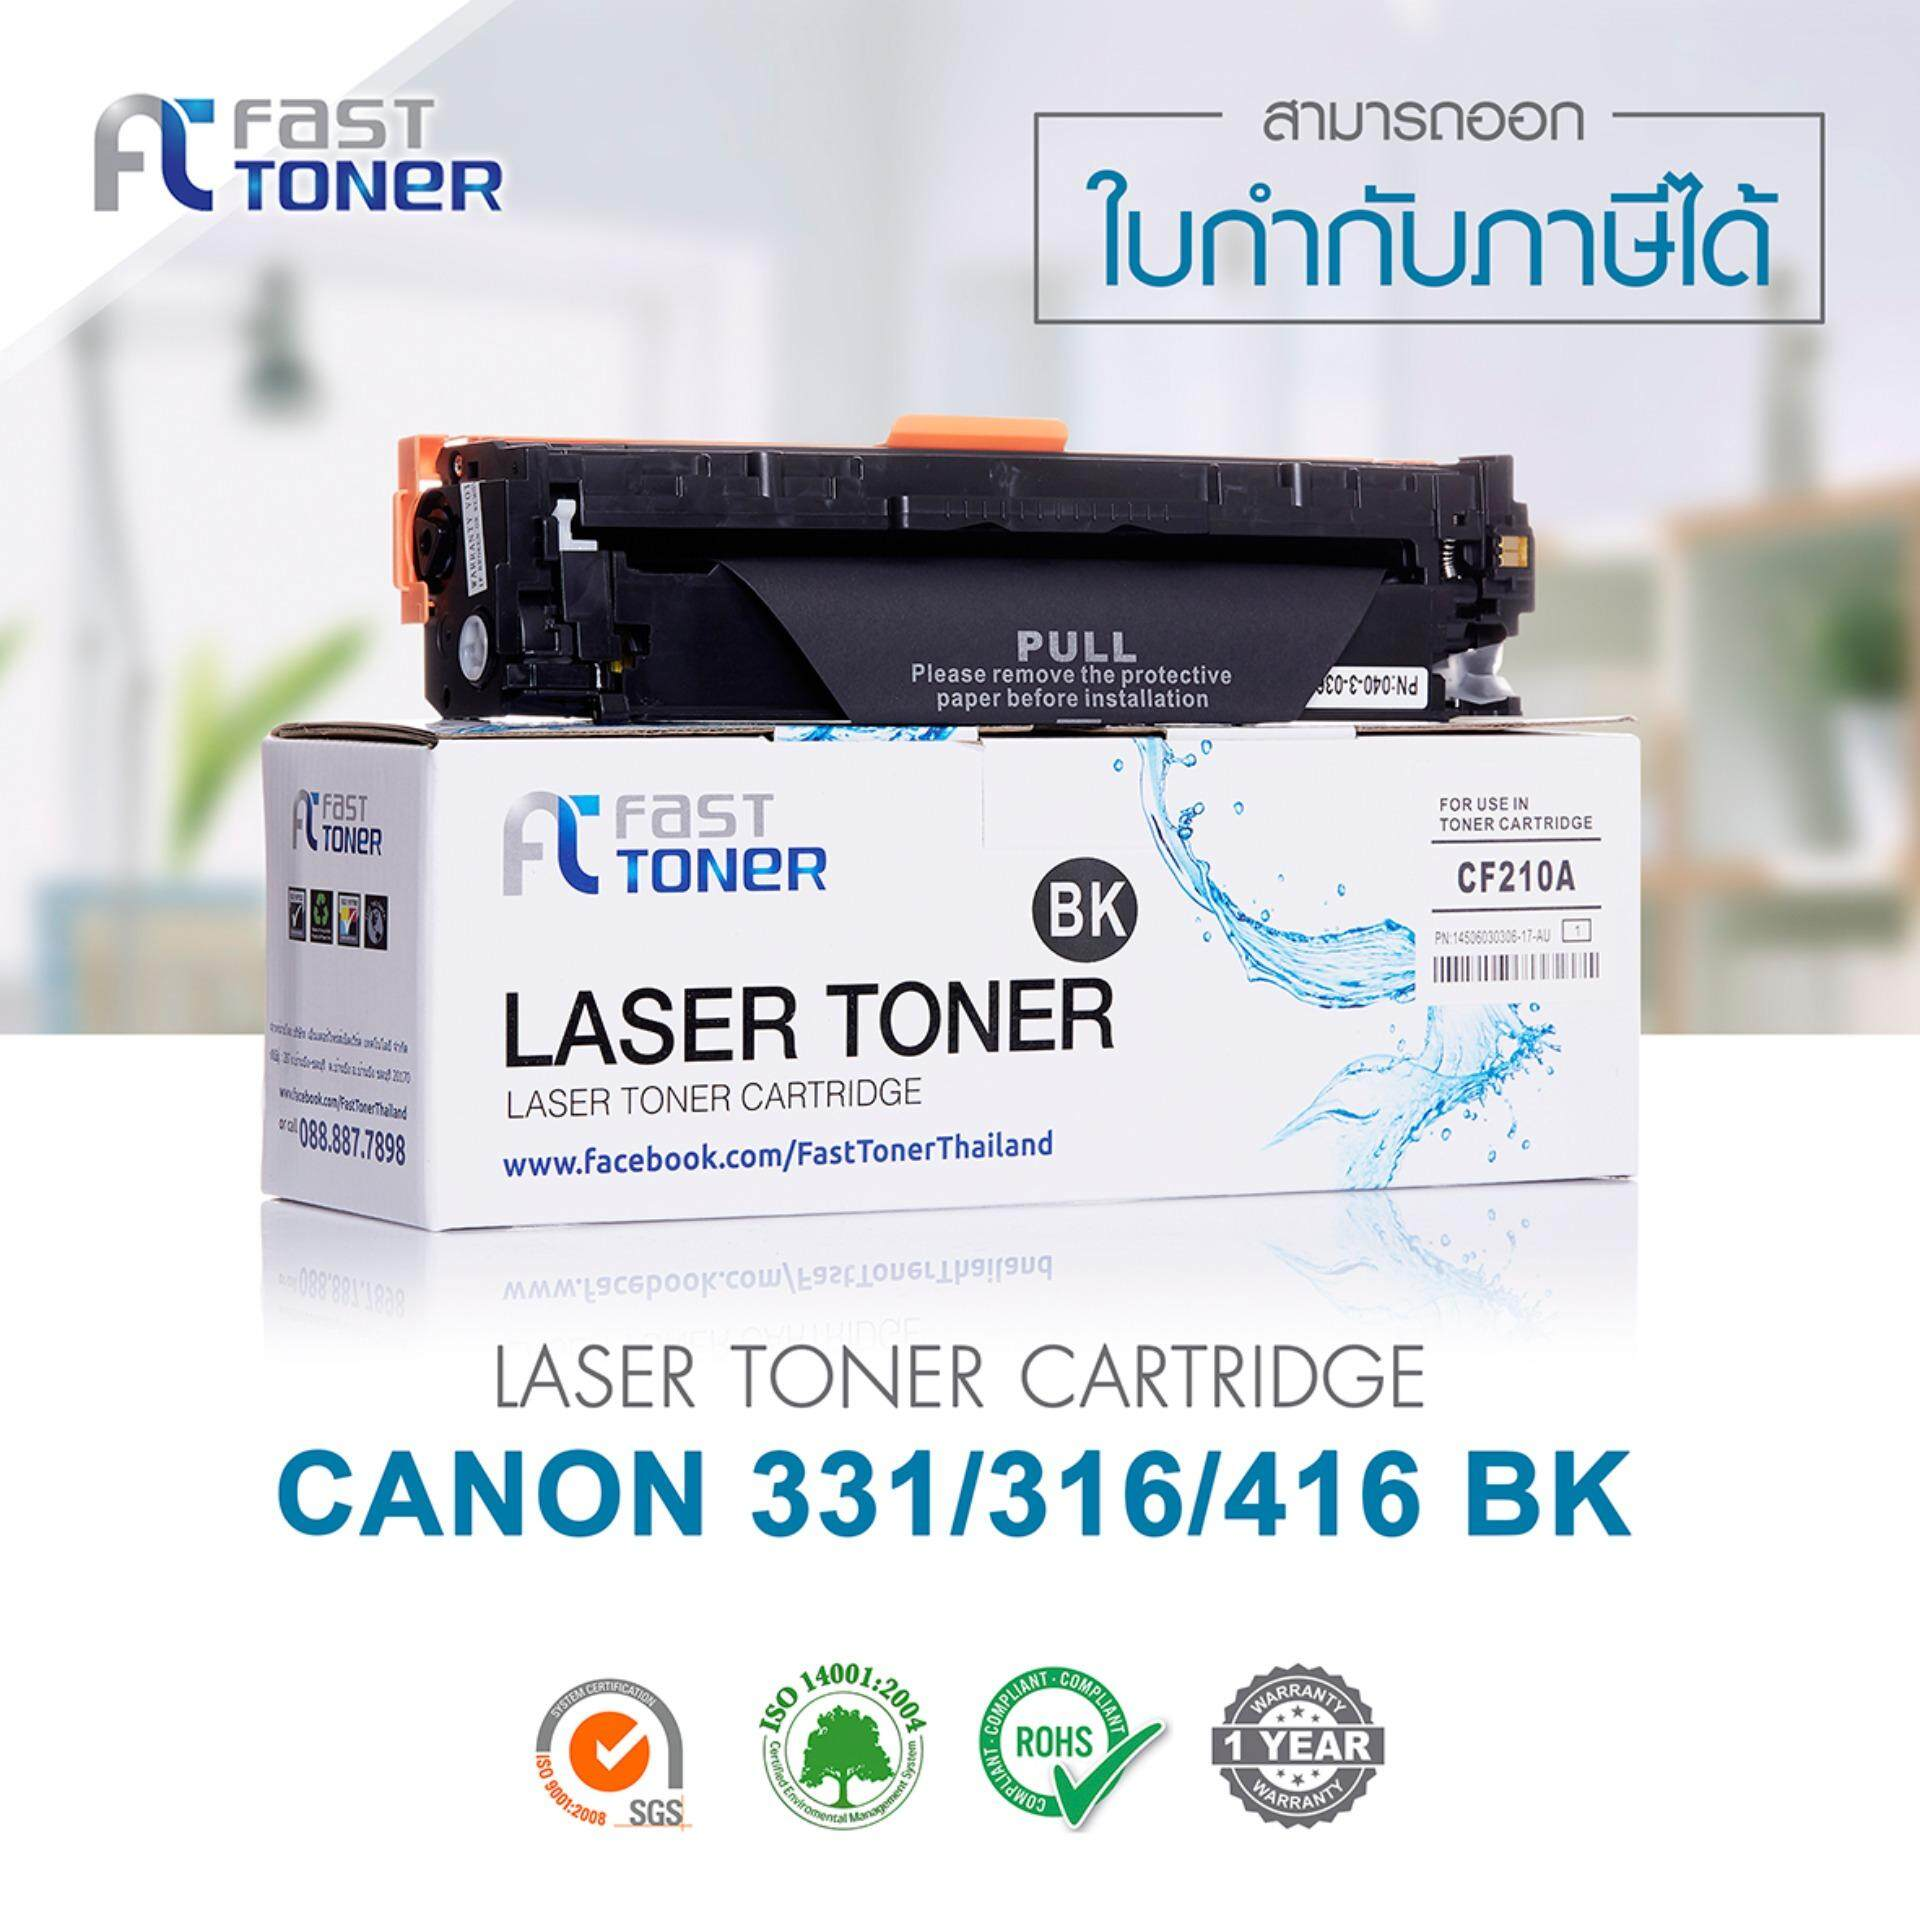 Fast Toner CANON ตลับหมึกพิมพ์เลเซอร์ CANON Cartridge-331/316/416 (Black)